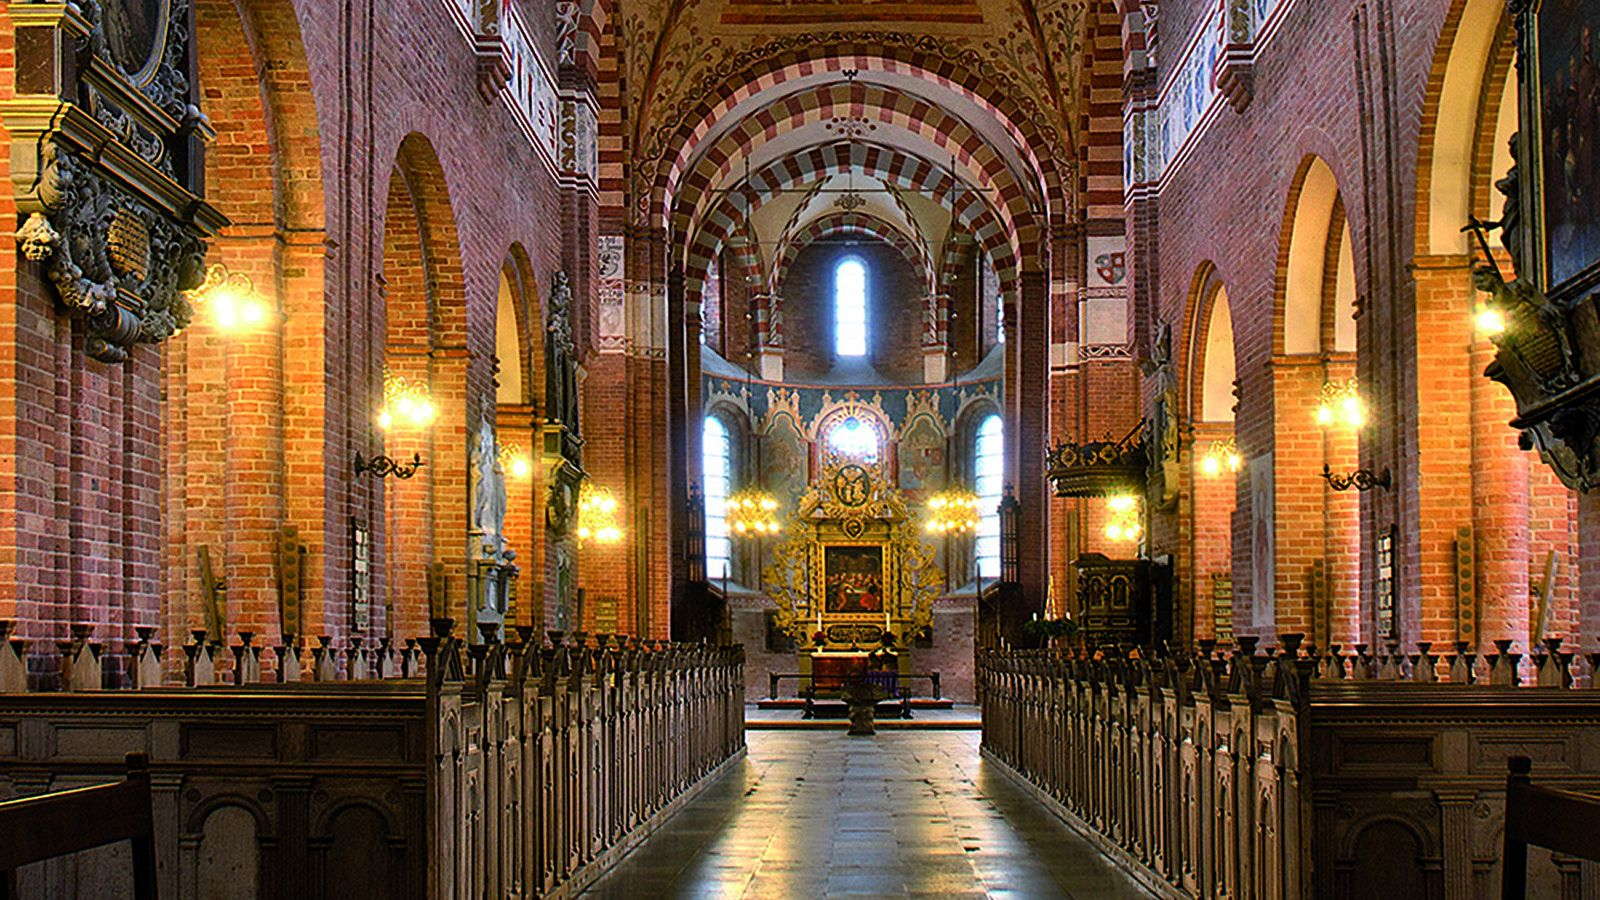 Sct. Bendts Kirkes midtskib og alter